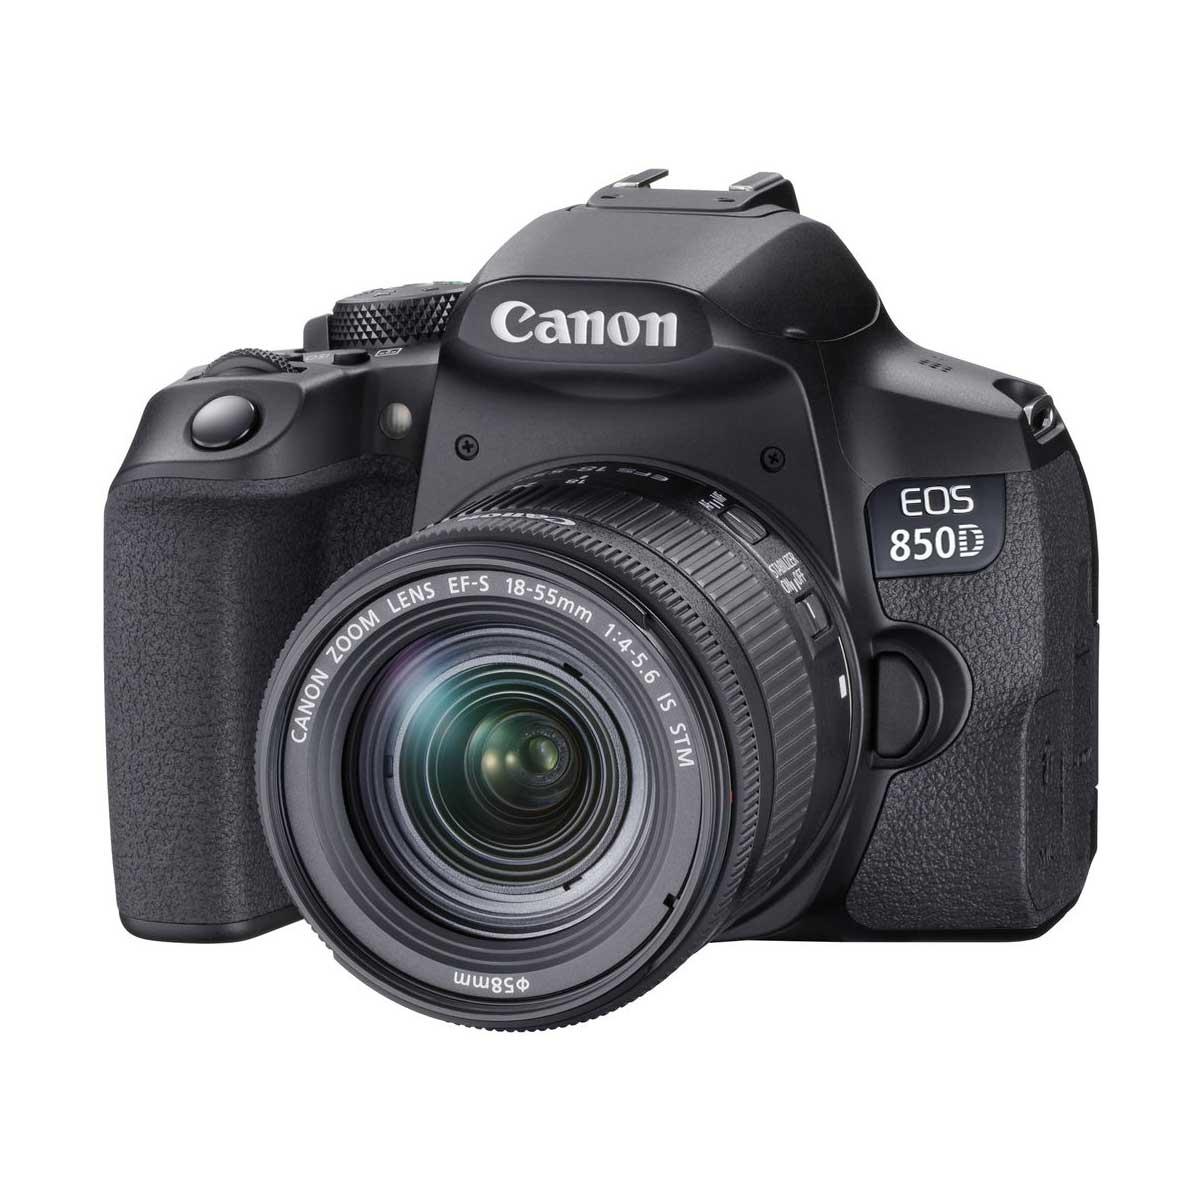 خرید دوربین کانن مدل EOS 850D